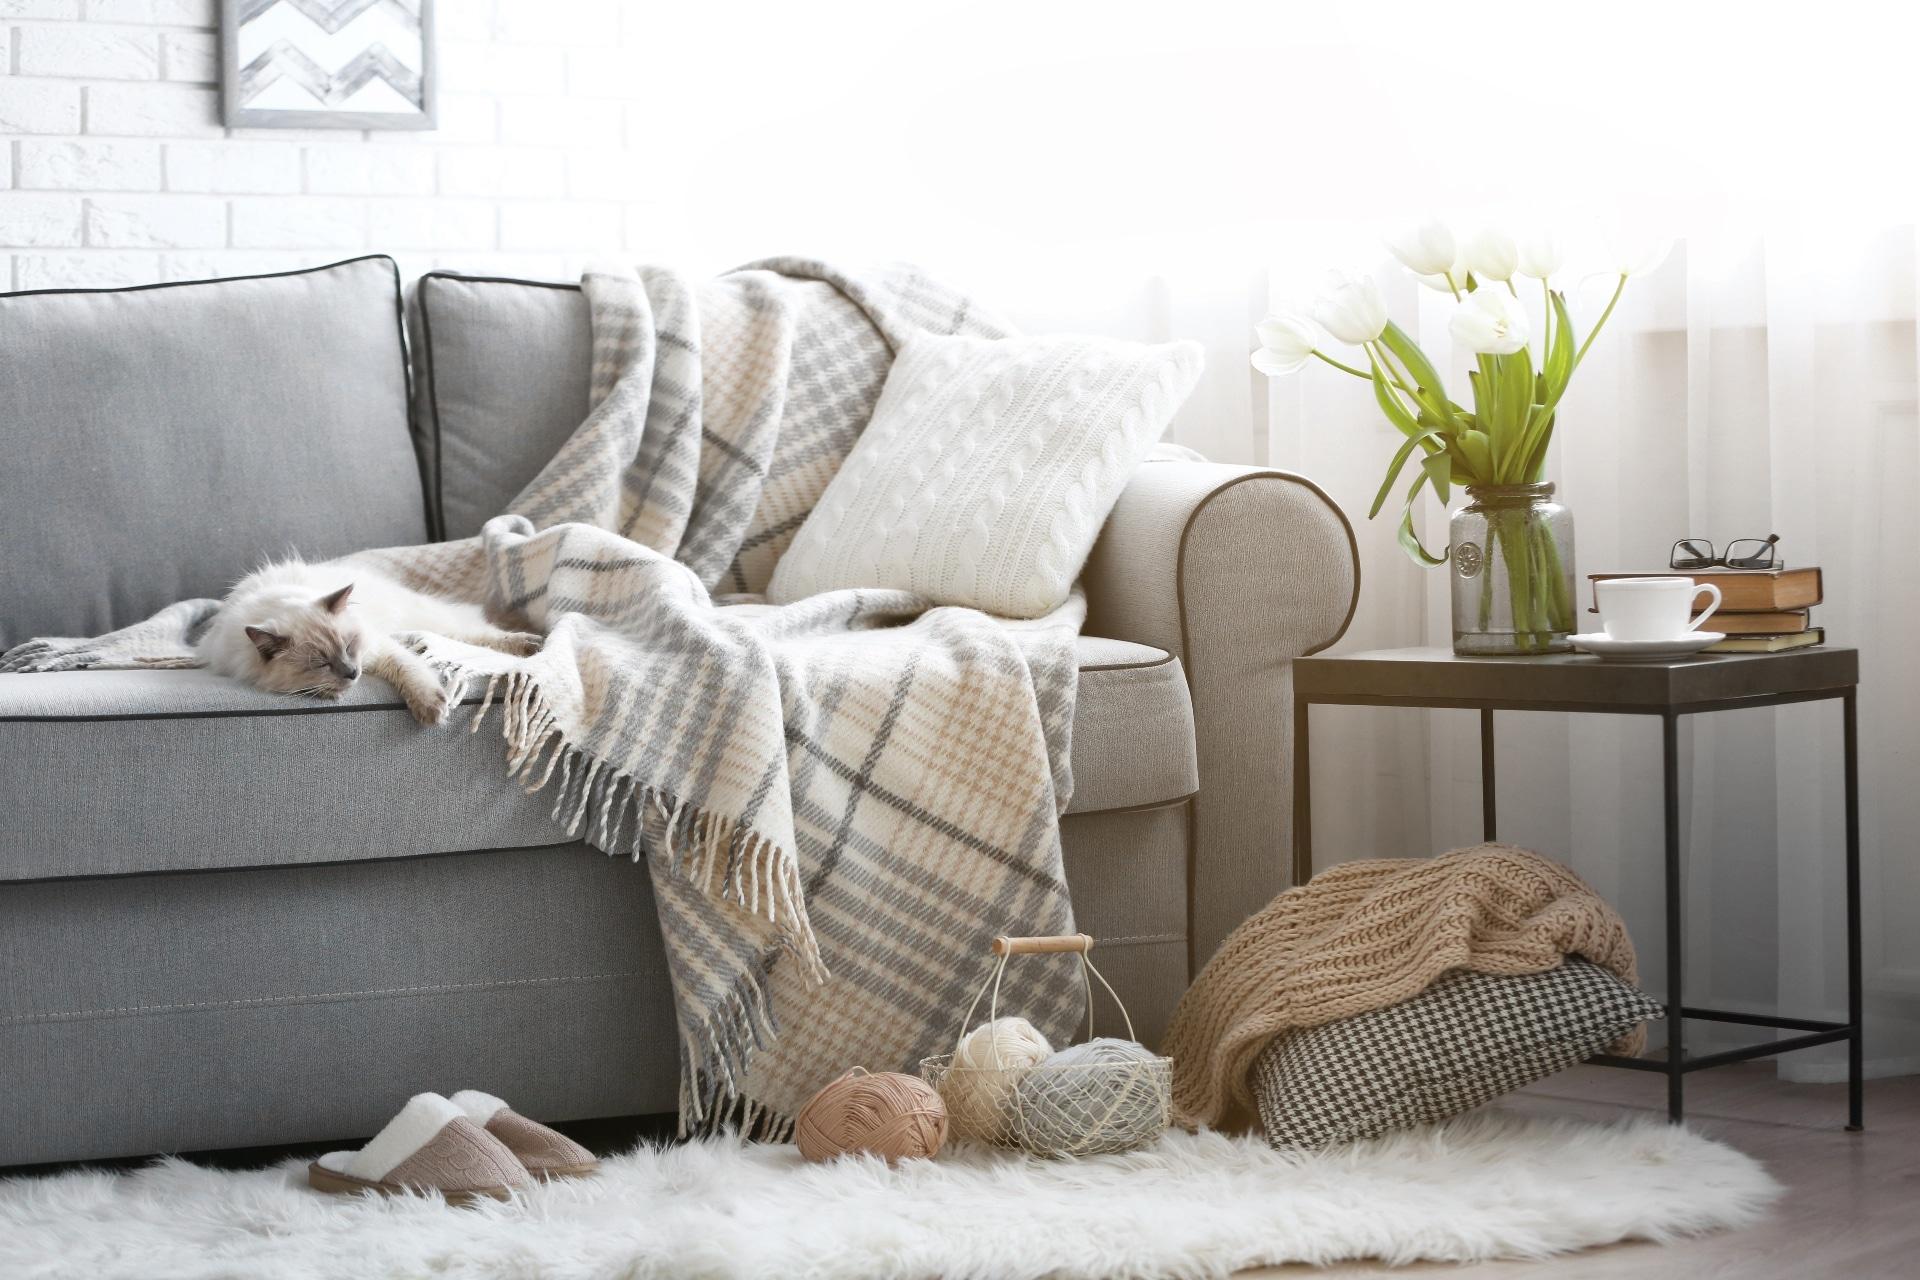 Living Room Winter Throws Pillows Carpets Kristine Bonnici Design